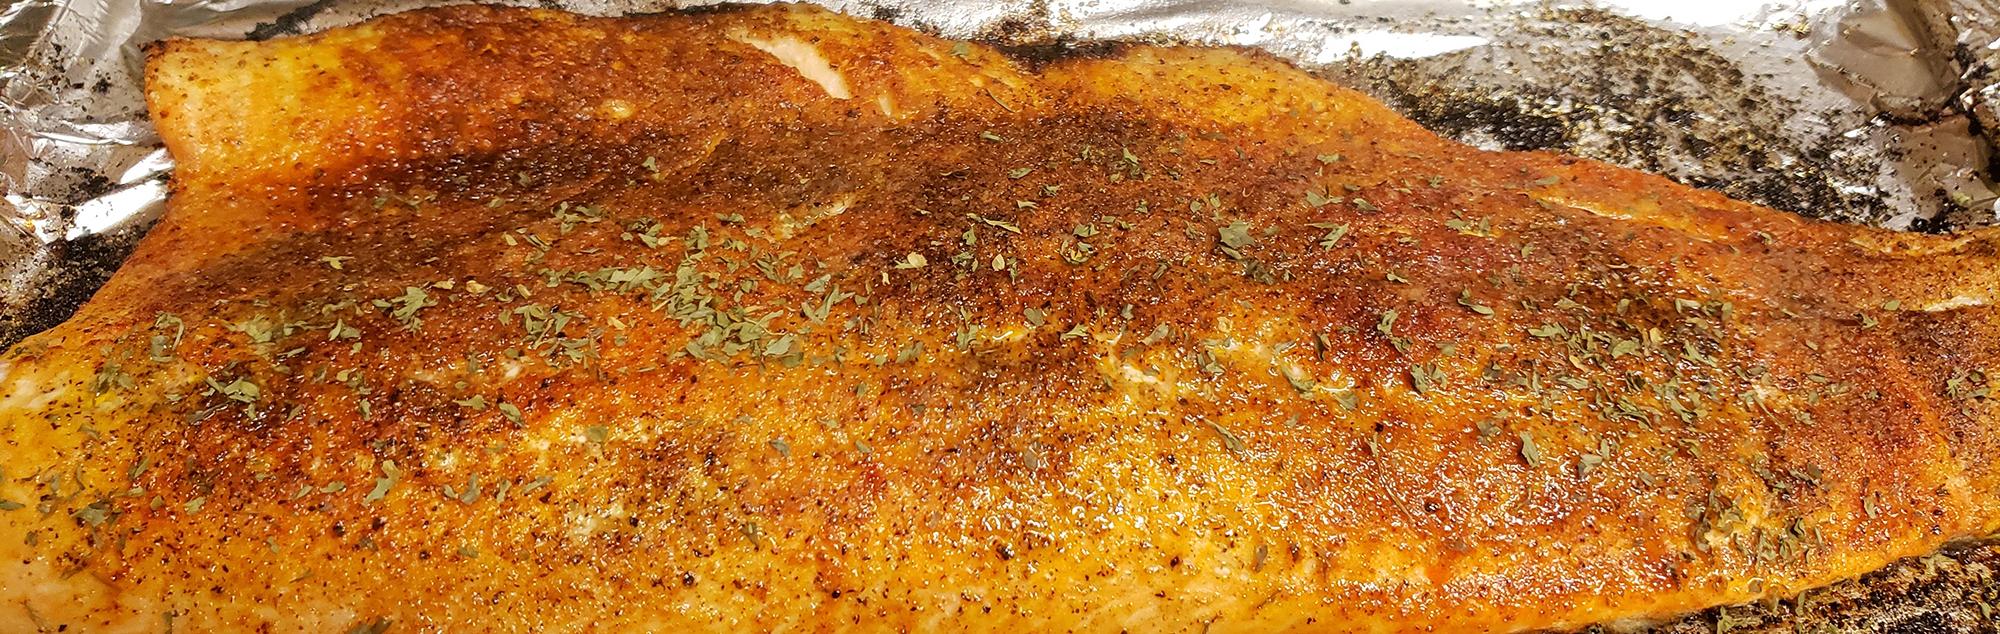 Recipe: Cajun and Lemon Pepper Salmon [Keto Friendly]